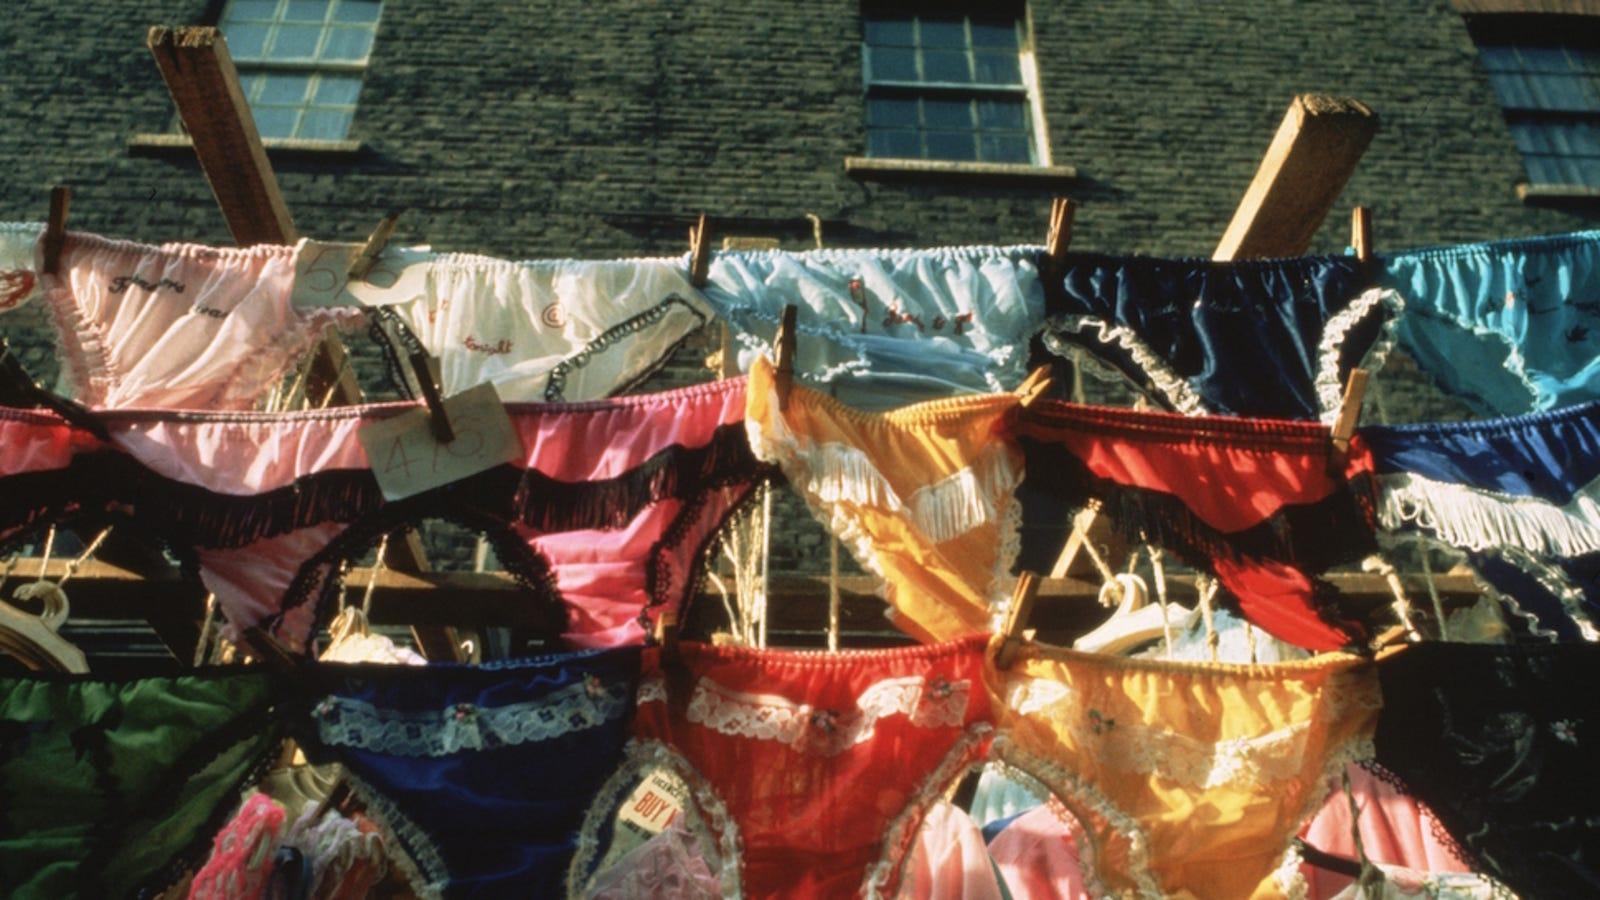 Underwear used sold at victorias secret marshalls catalog photo